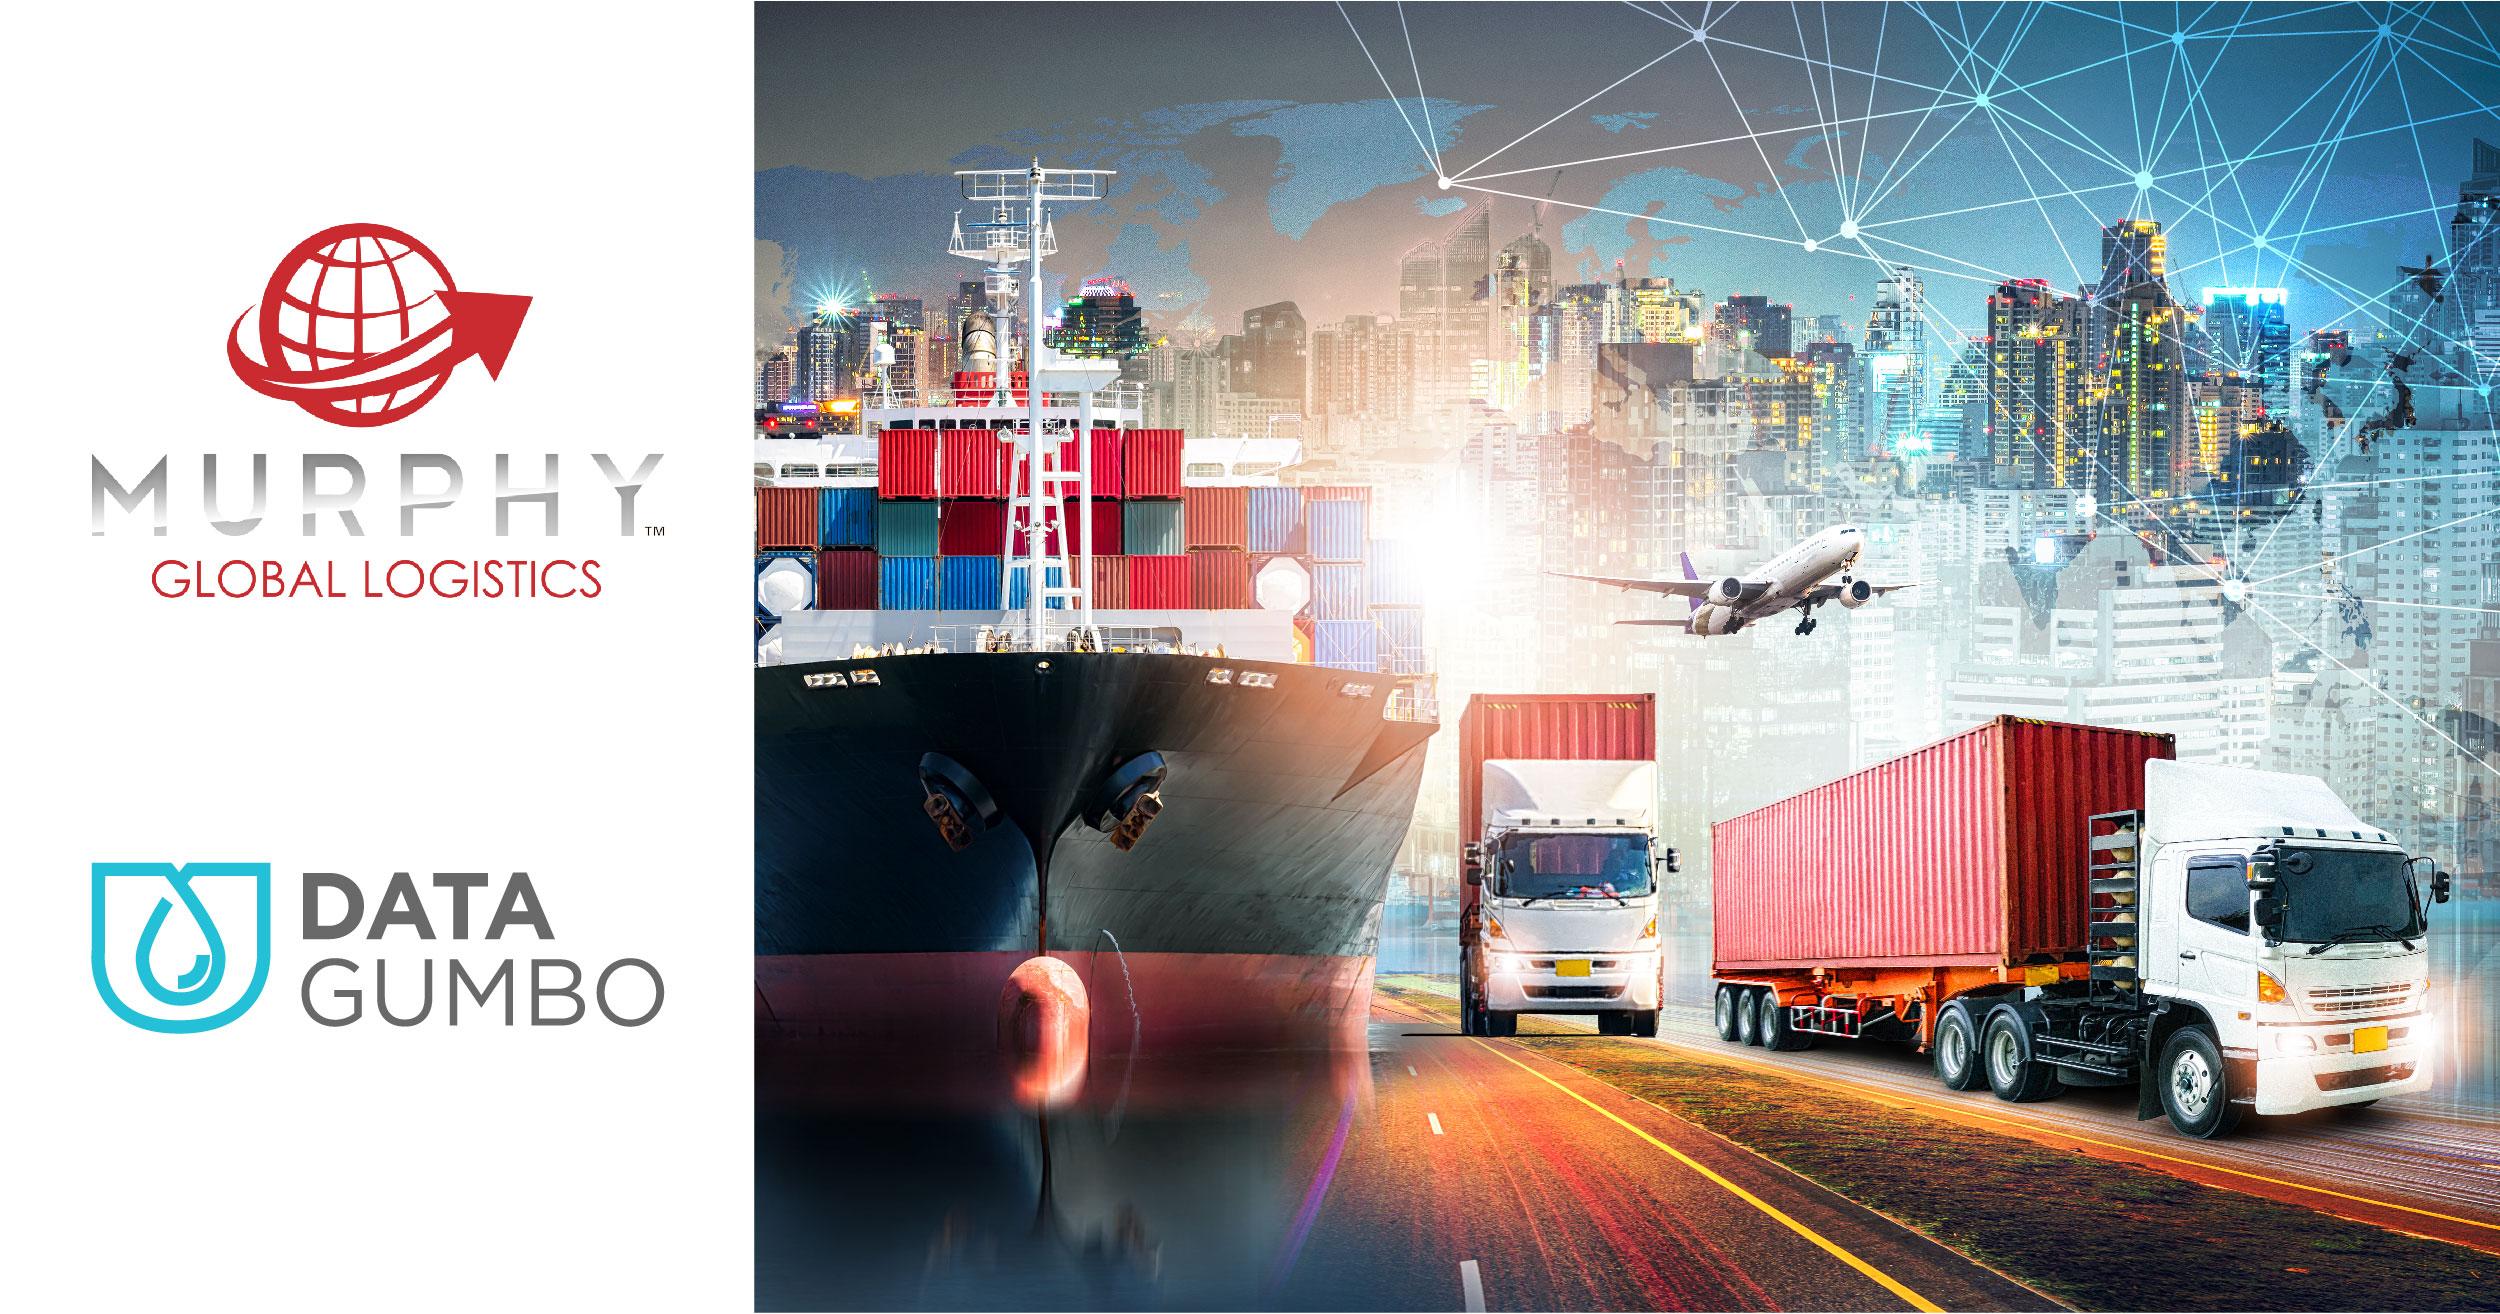 Murphy Global Logistics has adopted Data Gumbo's blockchain network, GumboNet